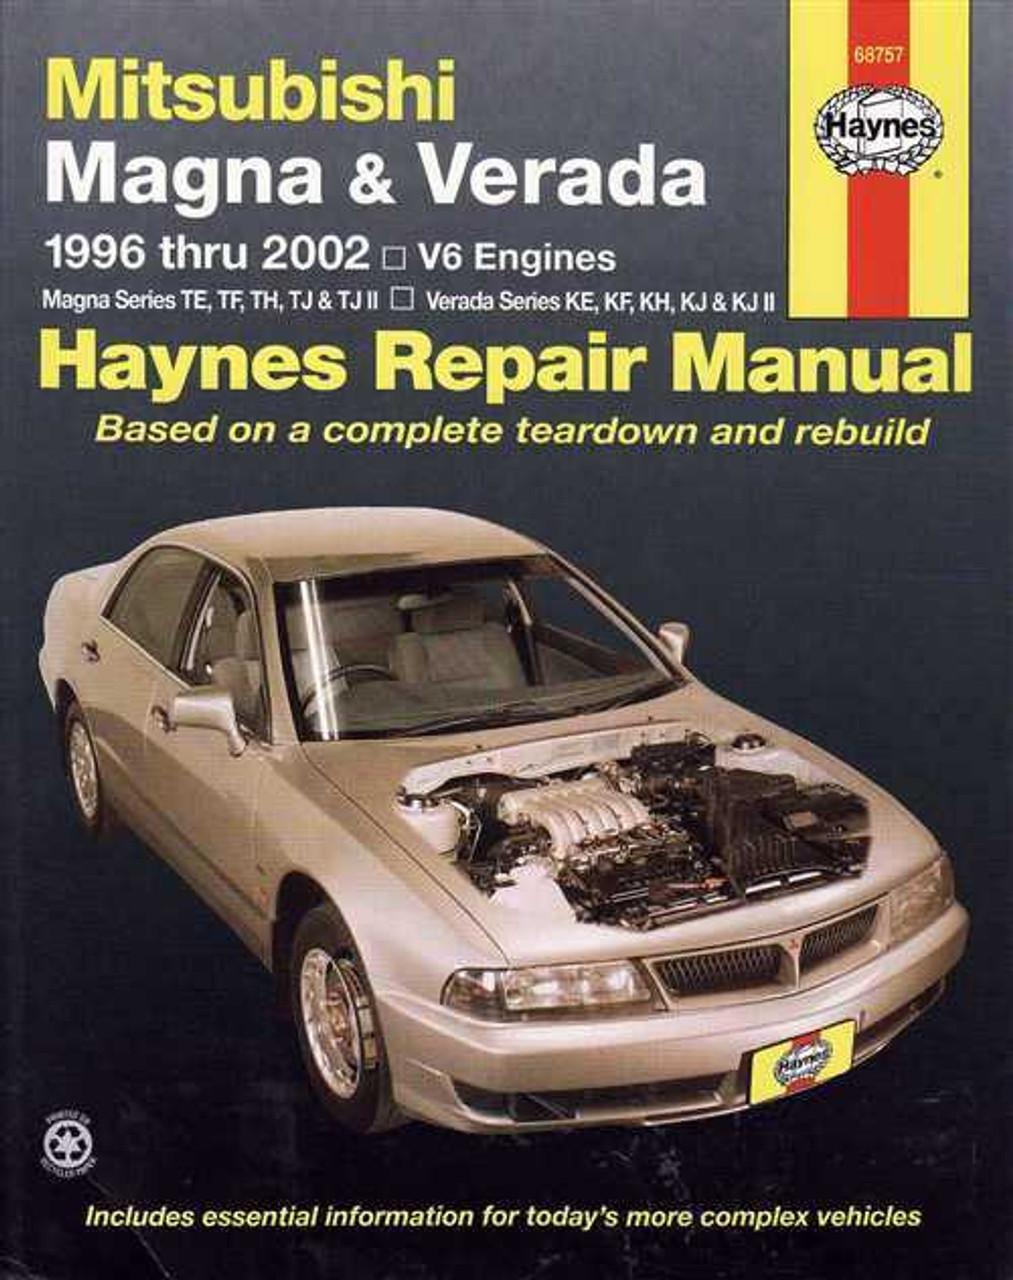 mitsubishi magna amp verada 1996 2002 workshop manual rh automotobookshop com au 1997 Mitsubishi Montero Sport Manual Mitsubishi Montero Engine Manual